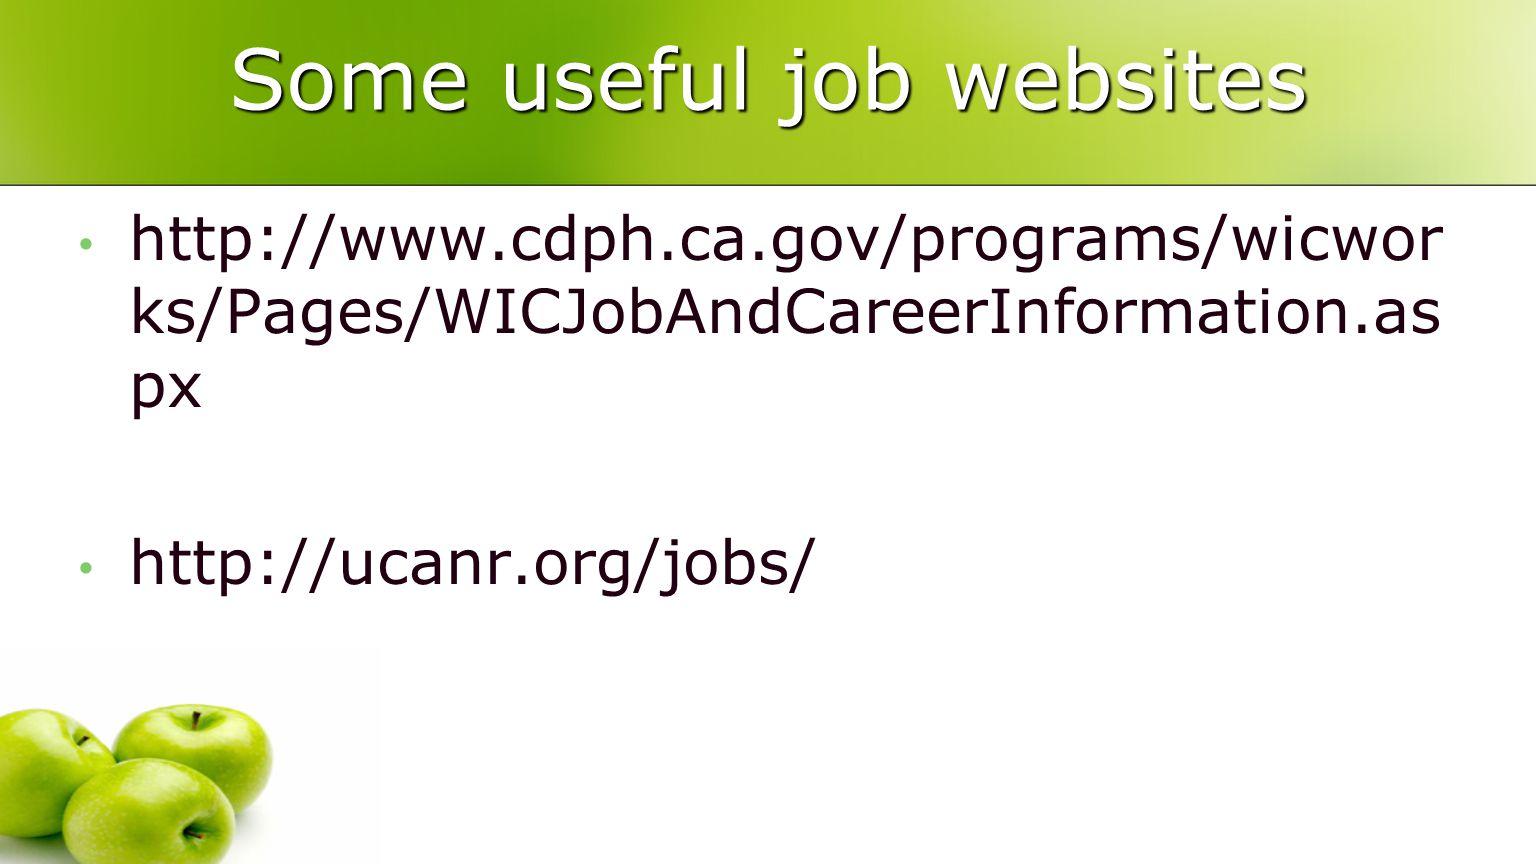 Some useful job websites http://www.cdph.ca.gov/programs/wicwor ks/Pages/WICJobAndCareerInformation.as px http://ucanr.org/jobs/